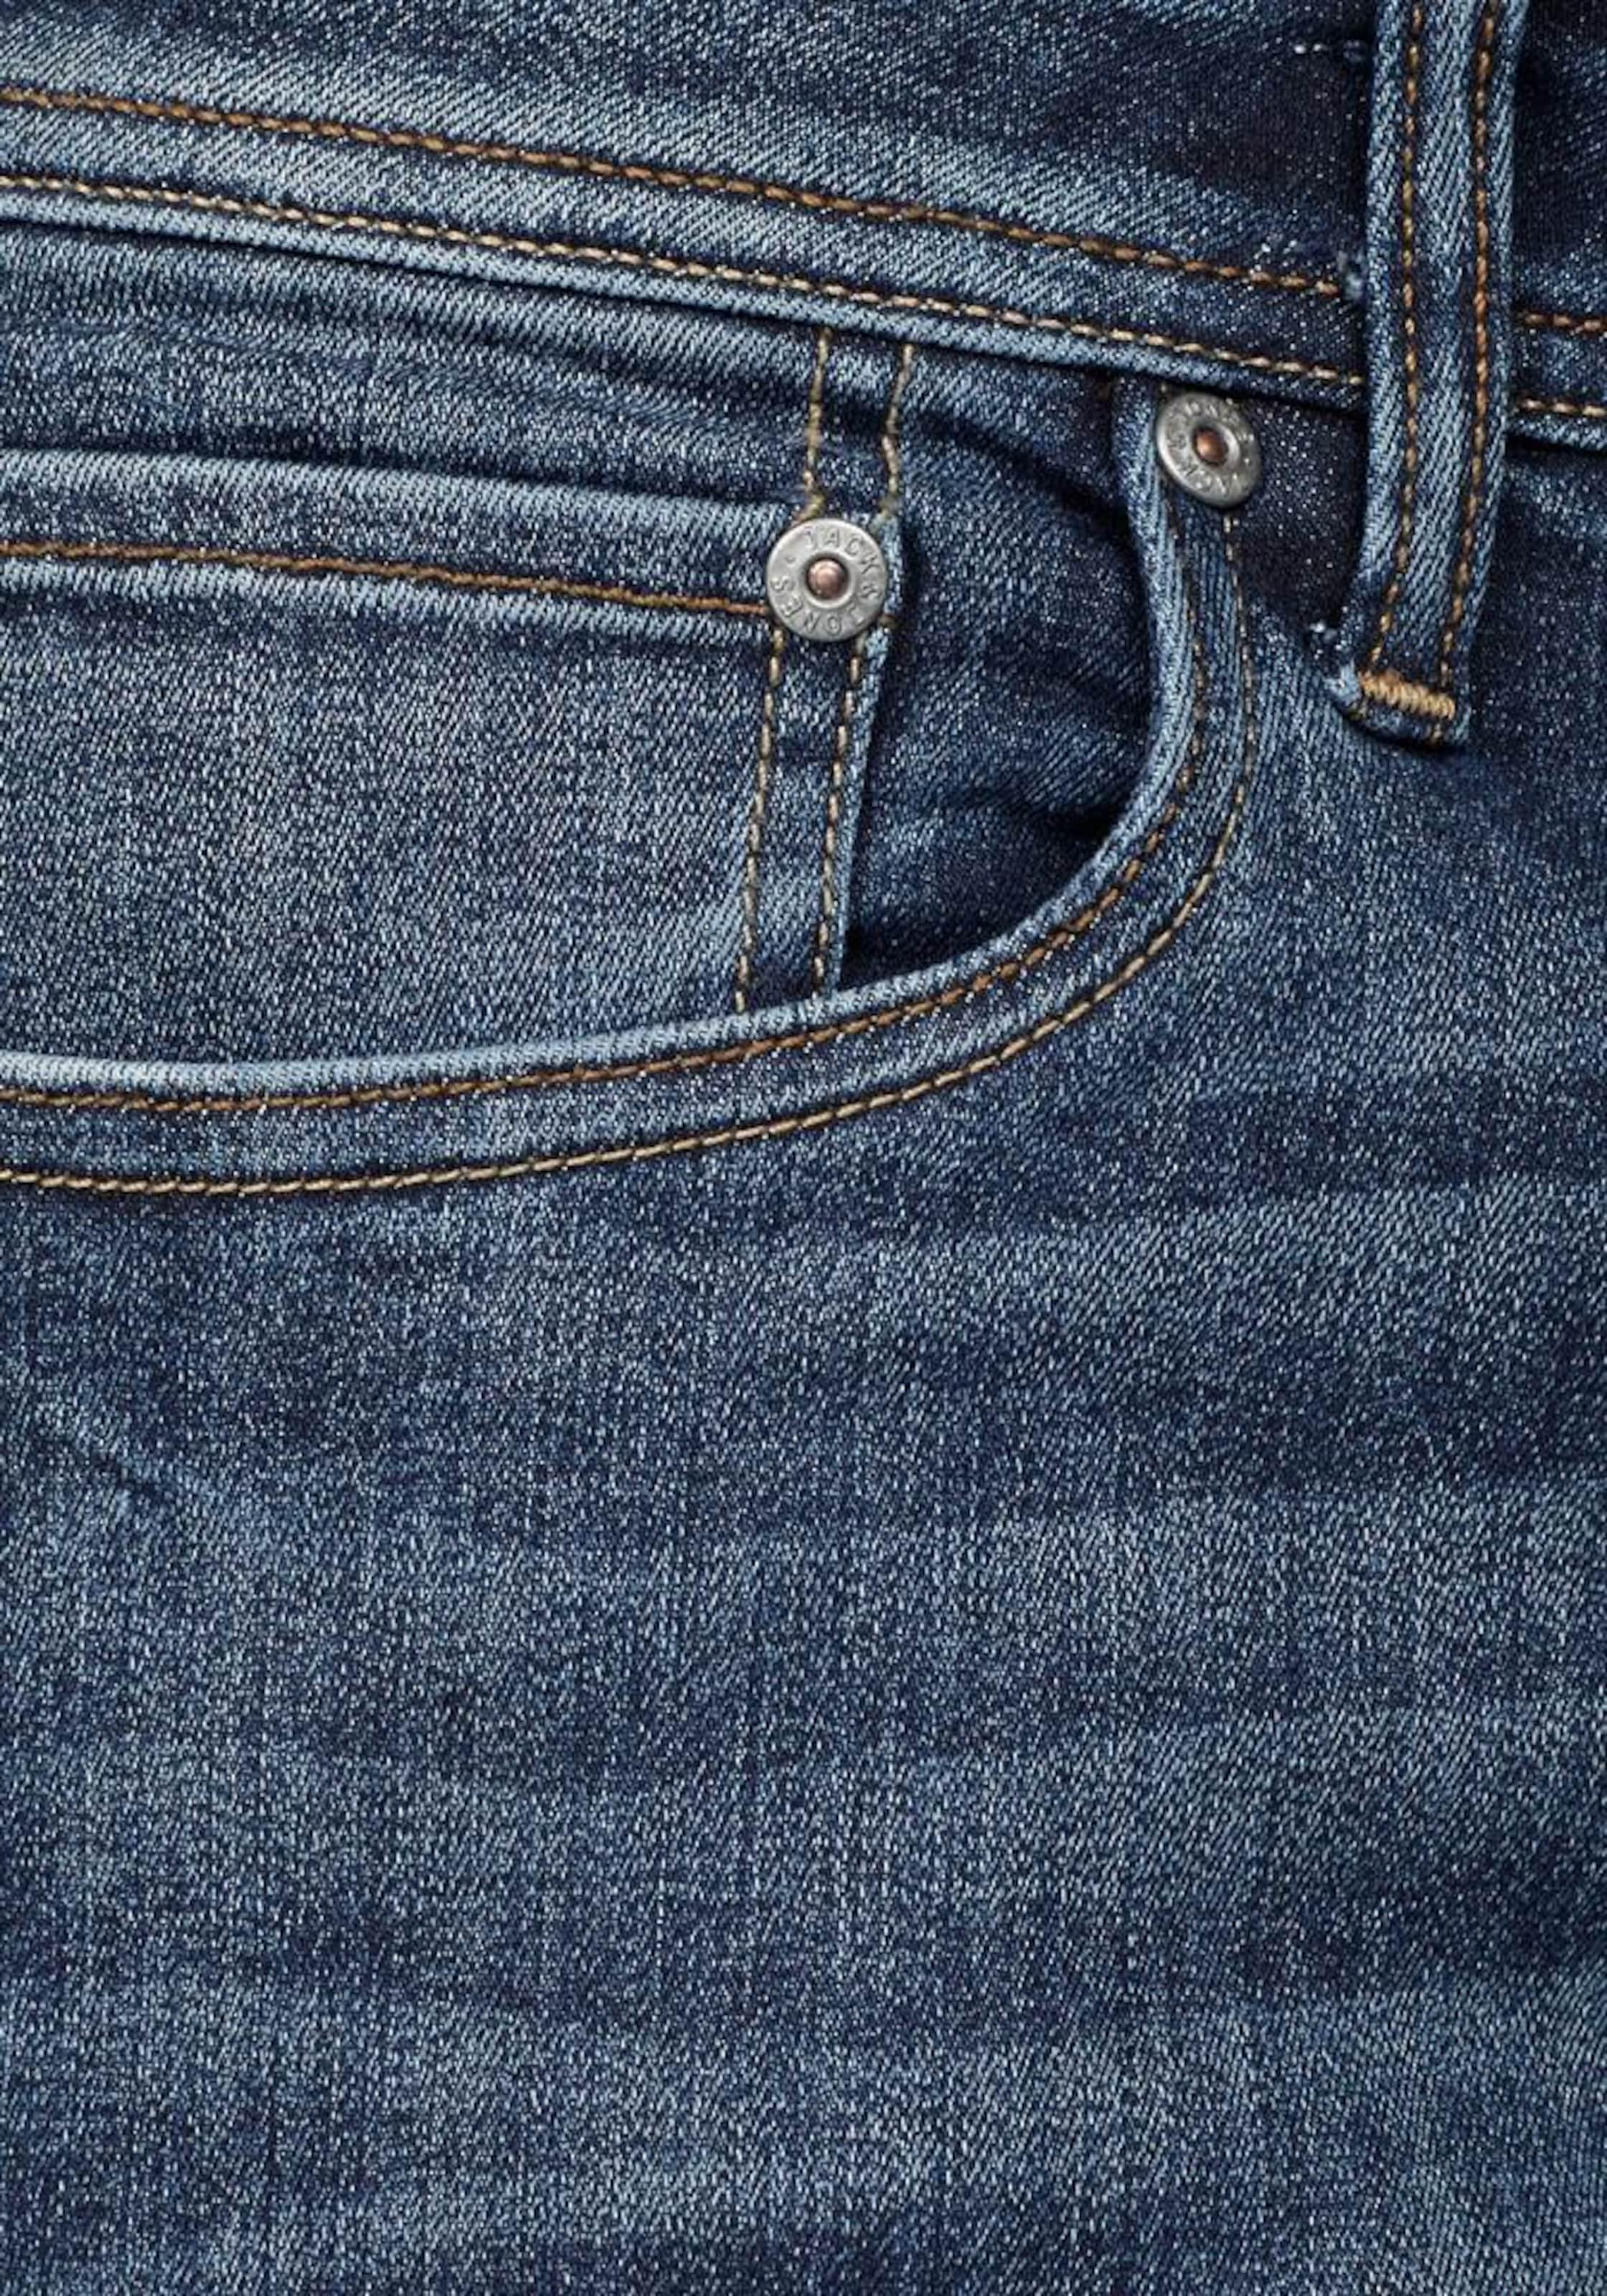 Rabatt Sneakernews 2018 Neu Zu Verkaufen JACK & JONES Regular-fit-Jeans »Clark« 5kkOWwHBEn